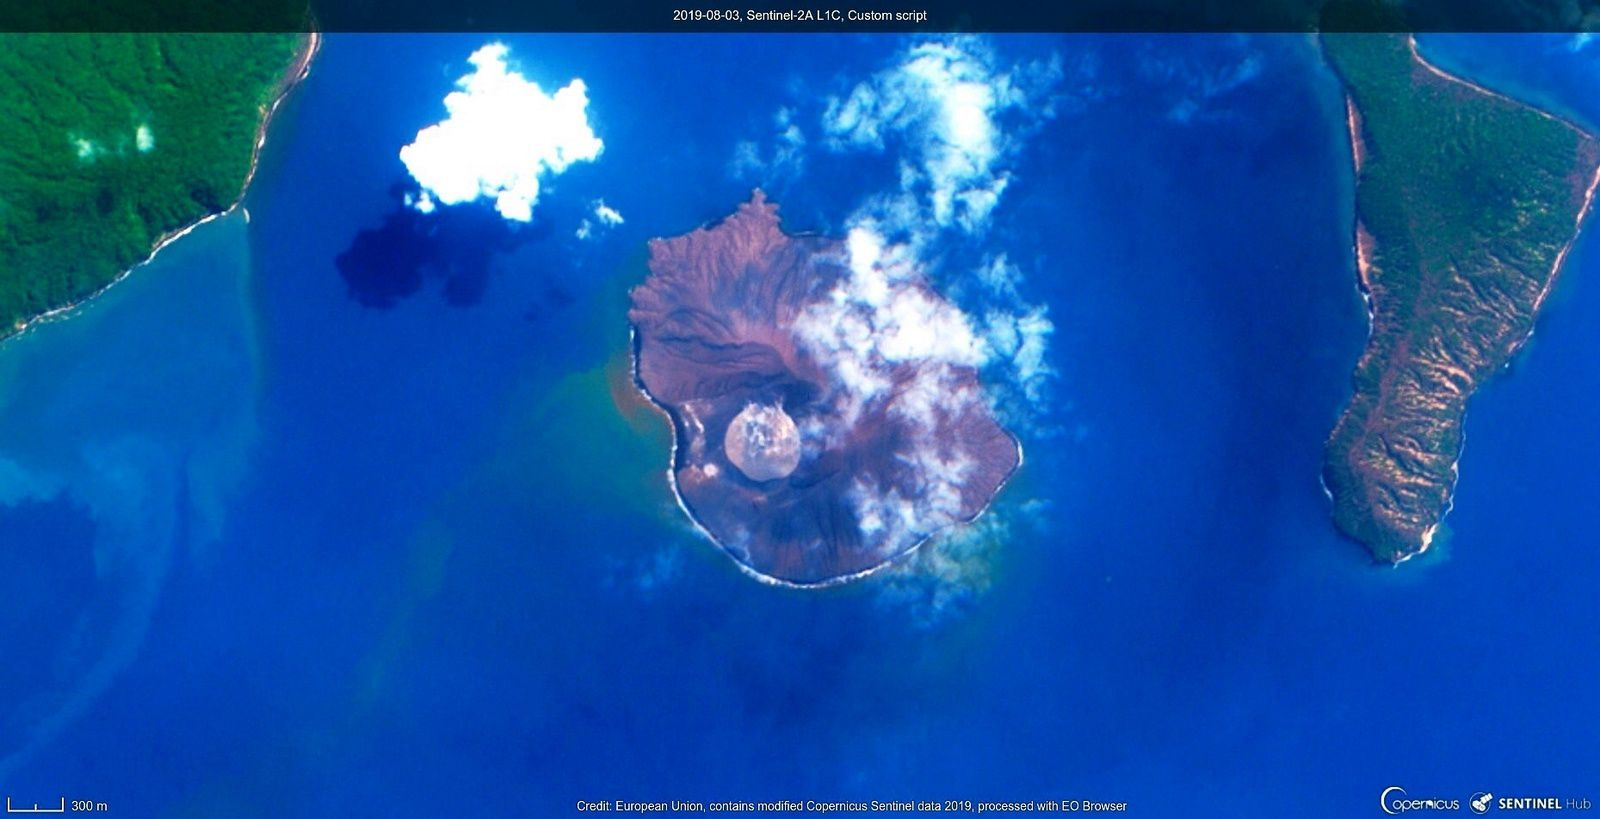 Anak Krakatau - Sentinel 2A L1C custom script du 03.08.2019 - Doc.Copernicus